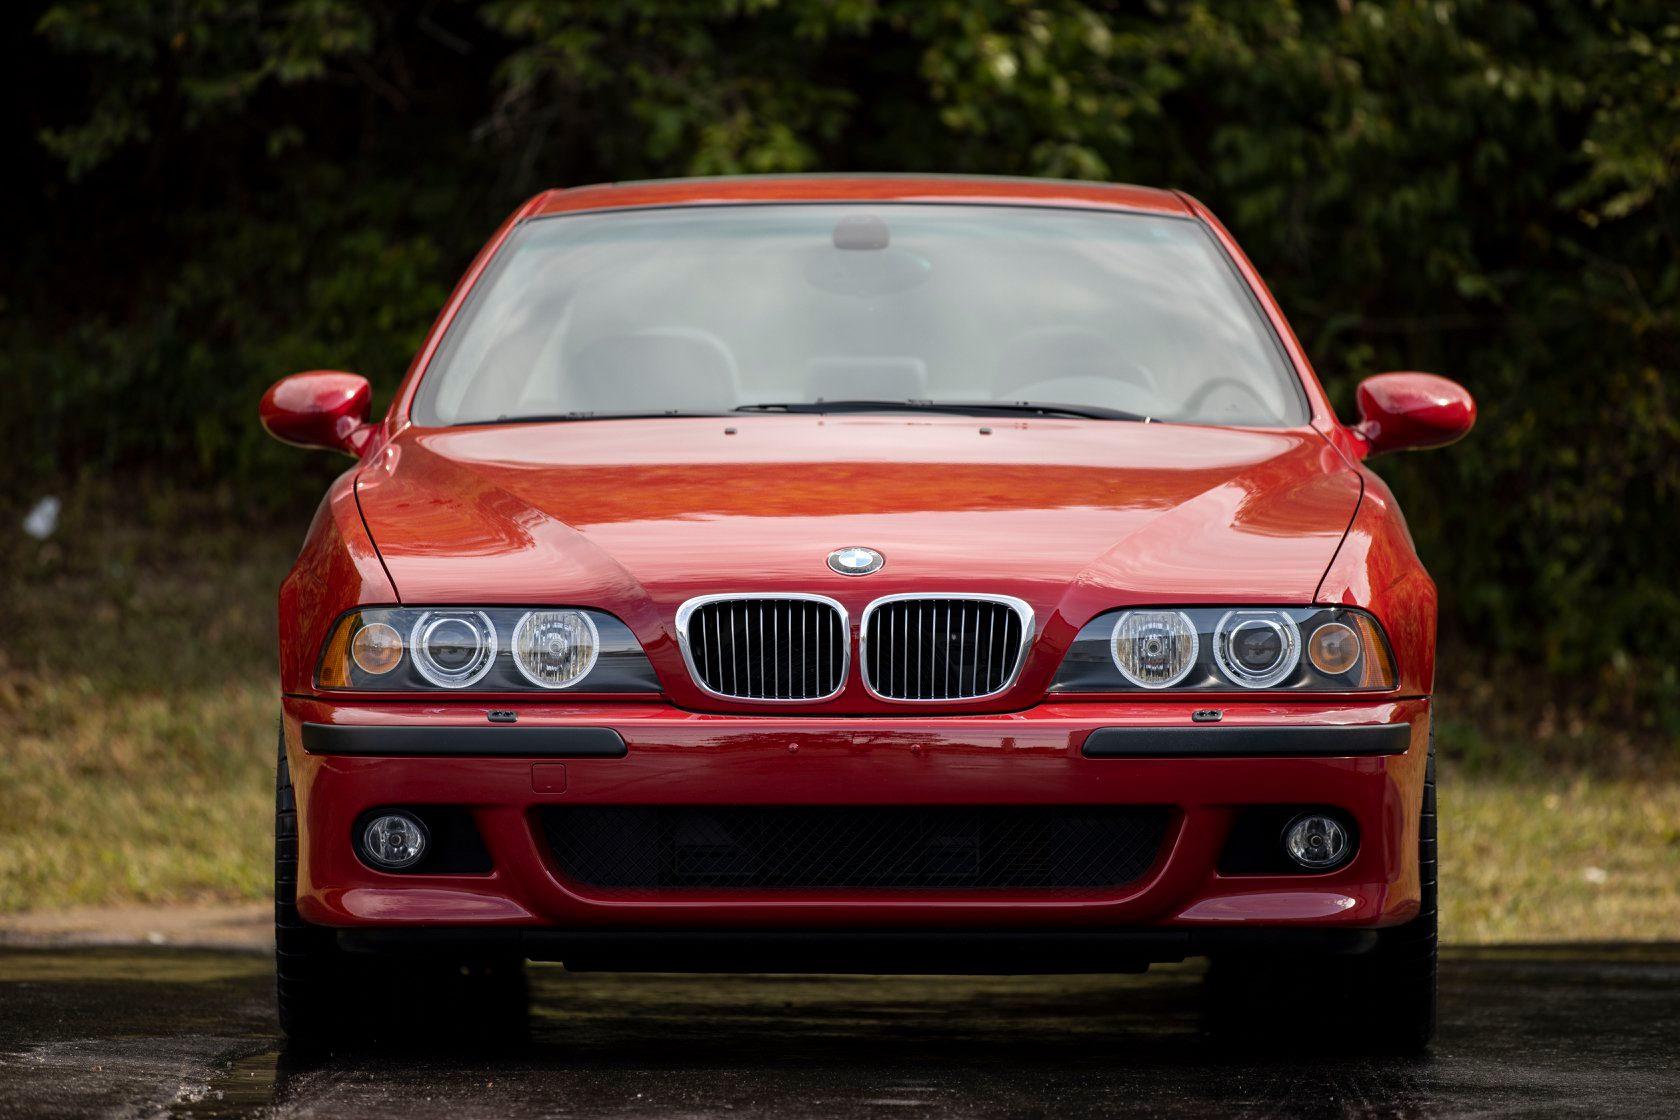 Prodaje se redak primerak BMW M5 E39, cena 150.000 dolara (VIDEO)